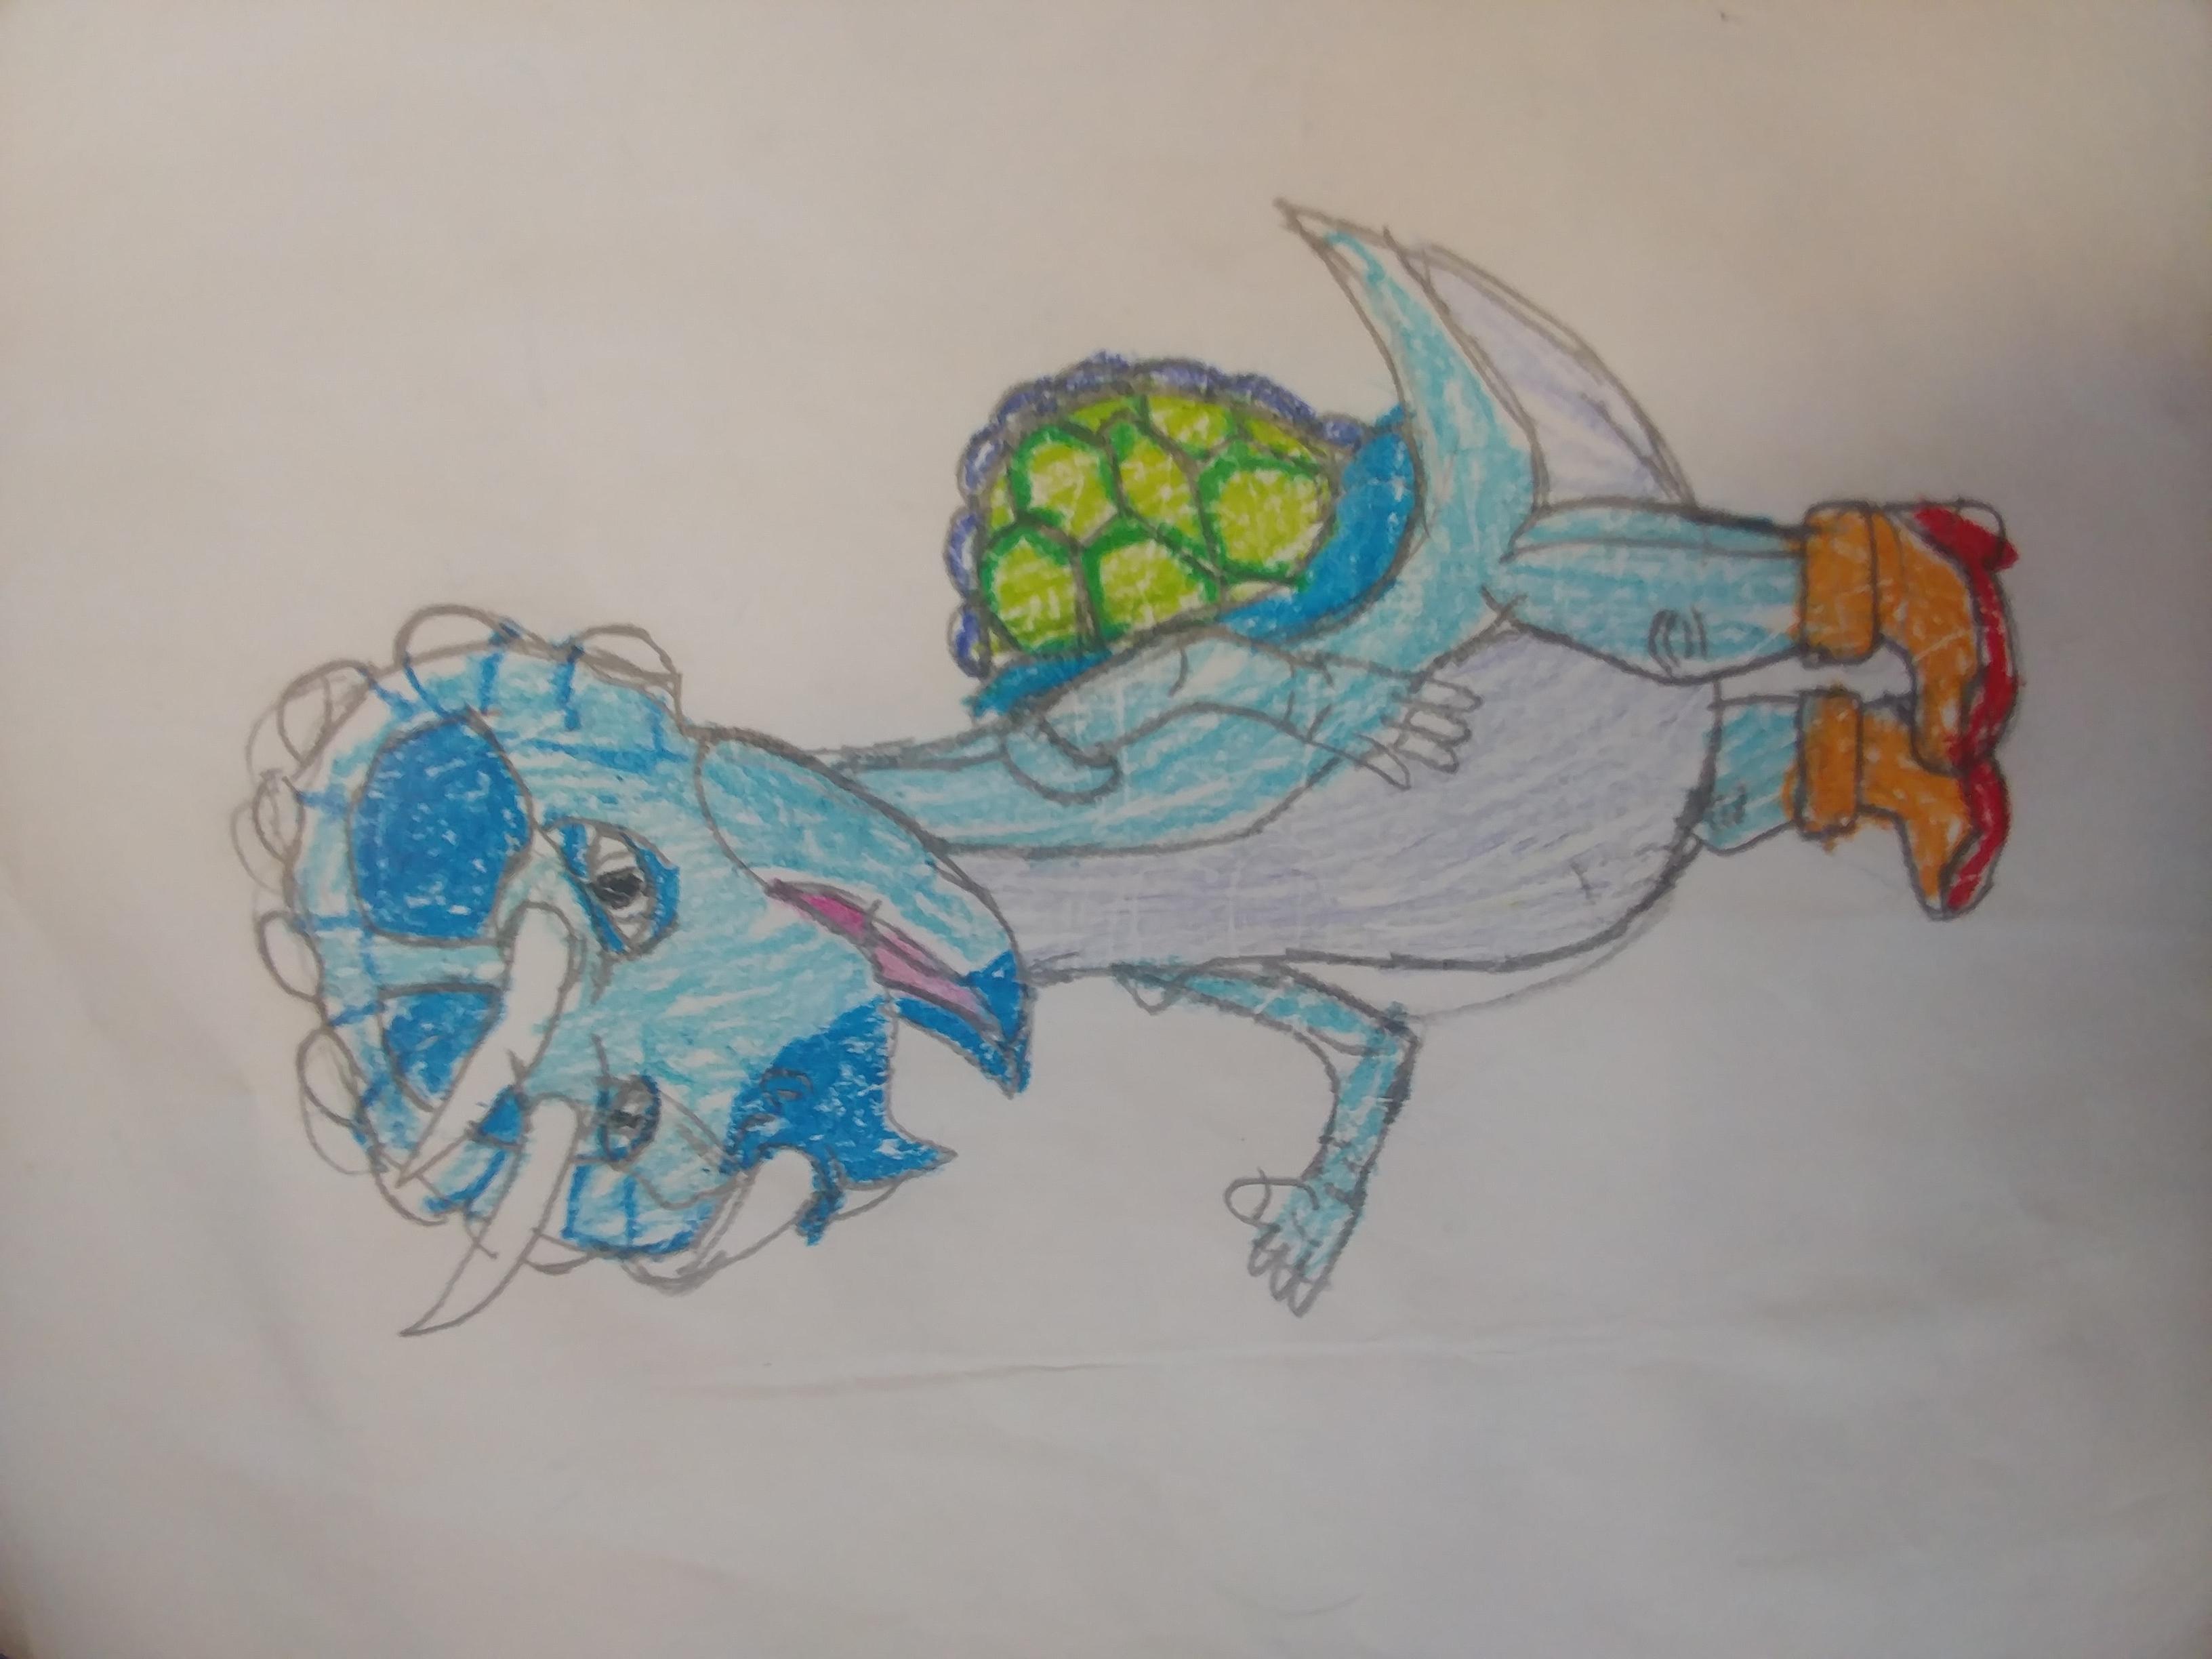 Rich Koopa (Image)